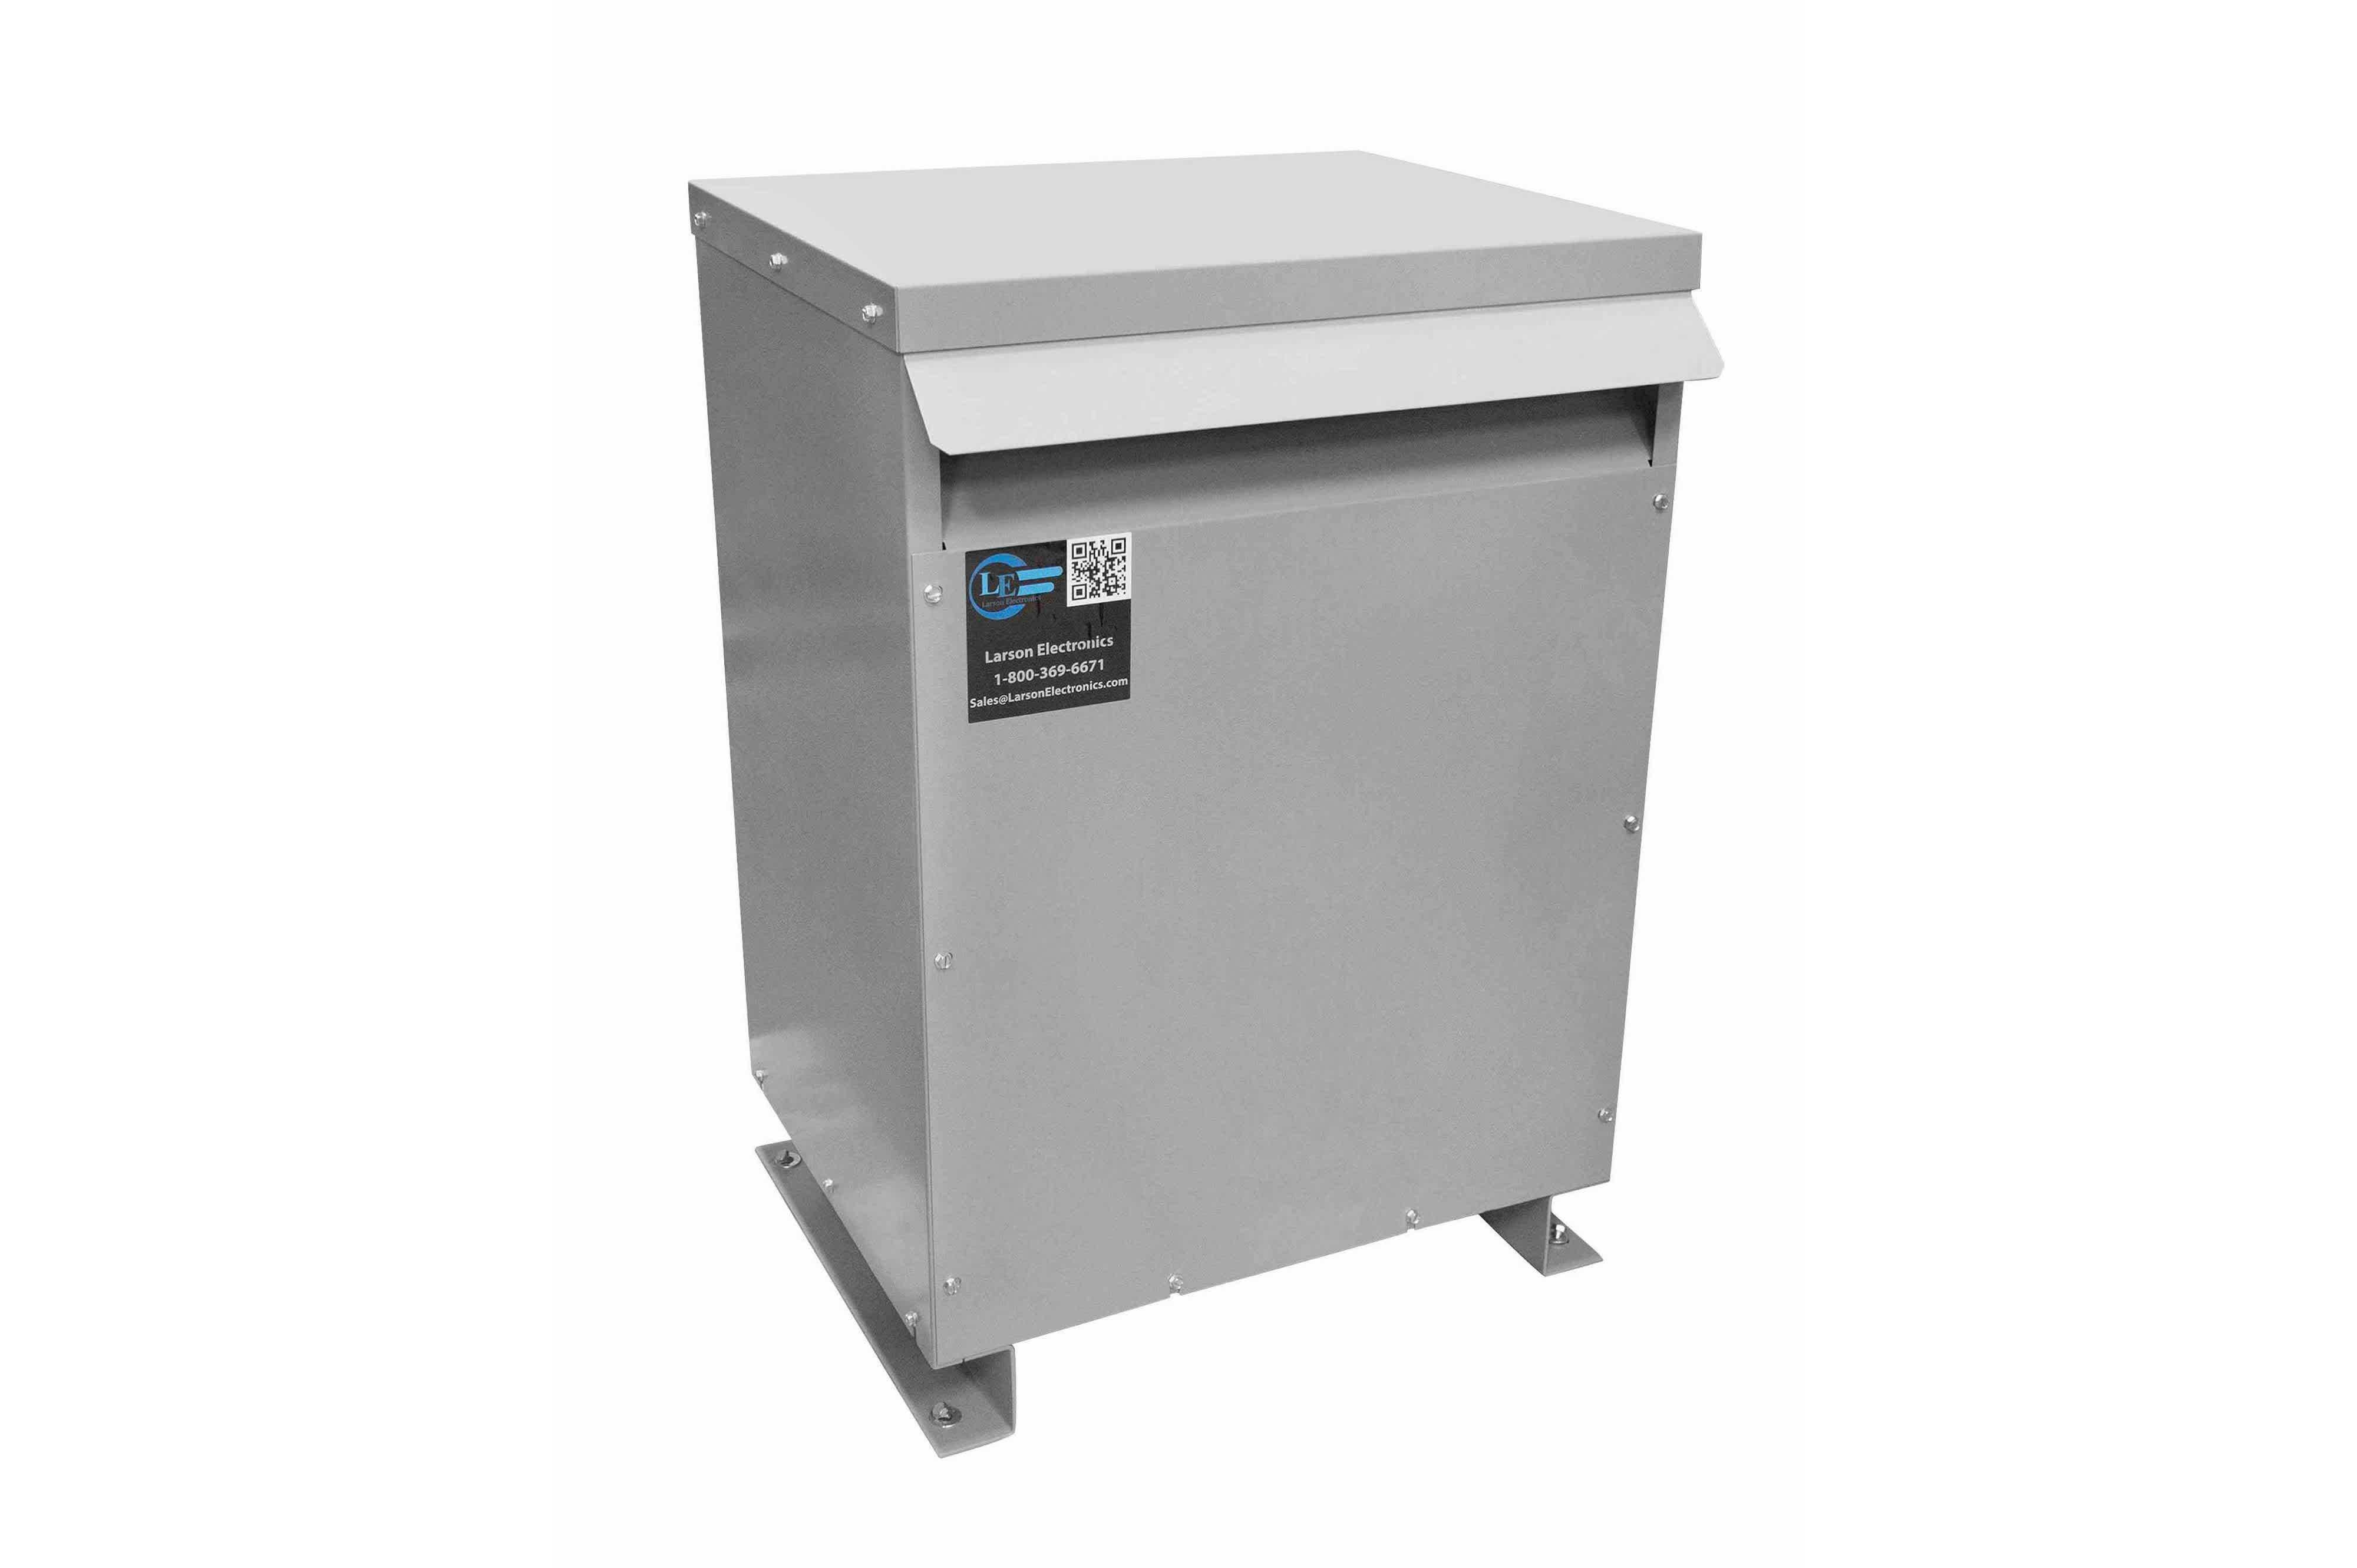 37.5 kVA 3PH Isolation Transformer, 380V Wye Primary, 240V/120 Delta Secondary, N3R, Ventilated, 60 Hz